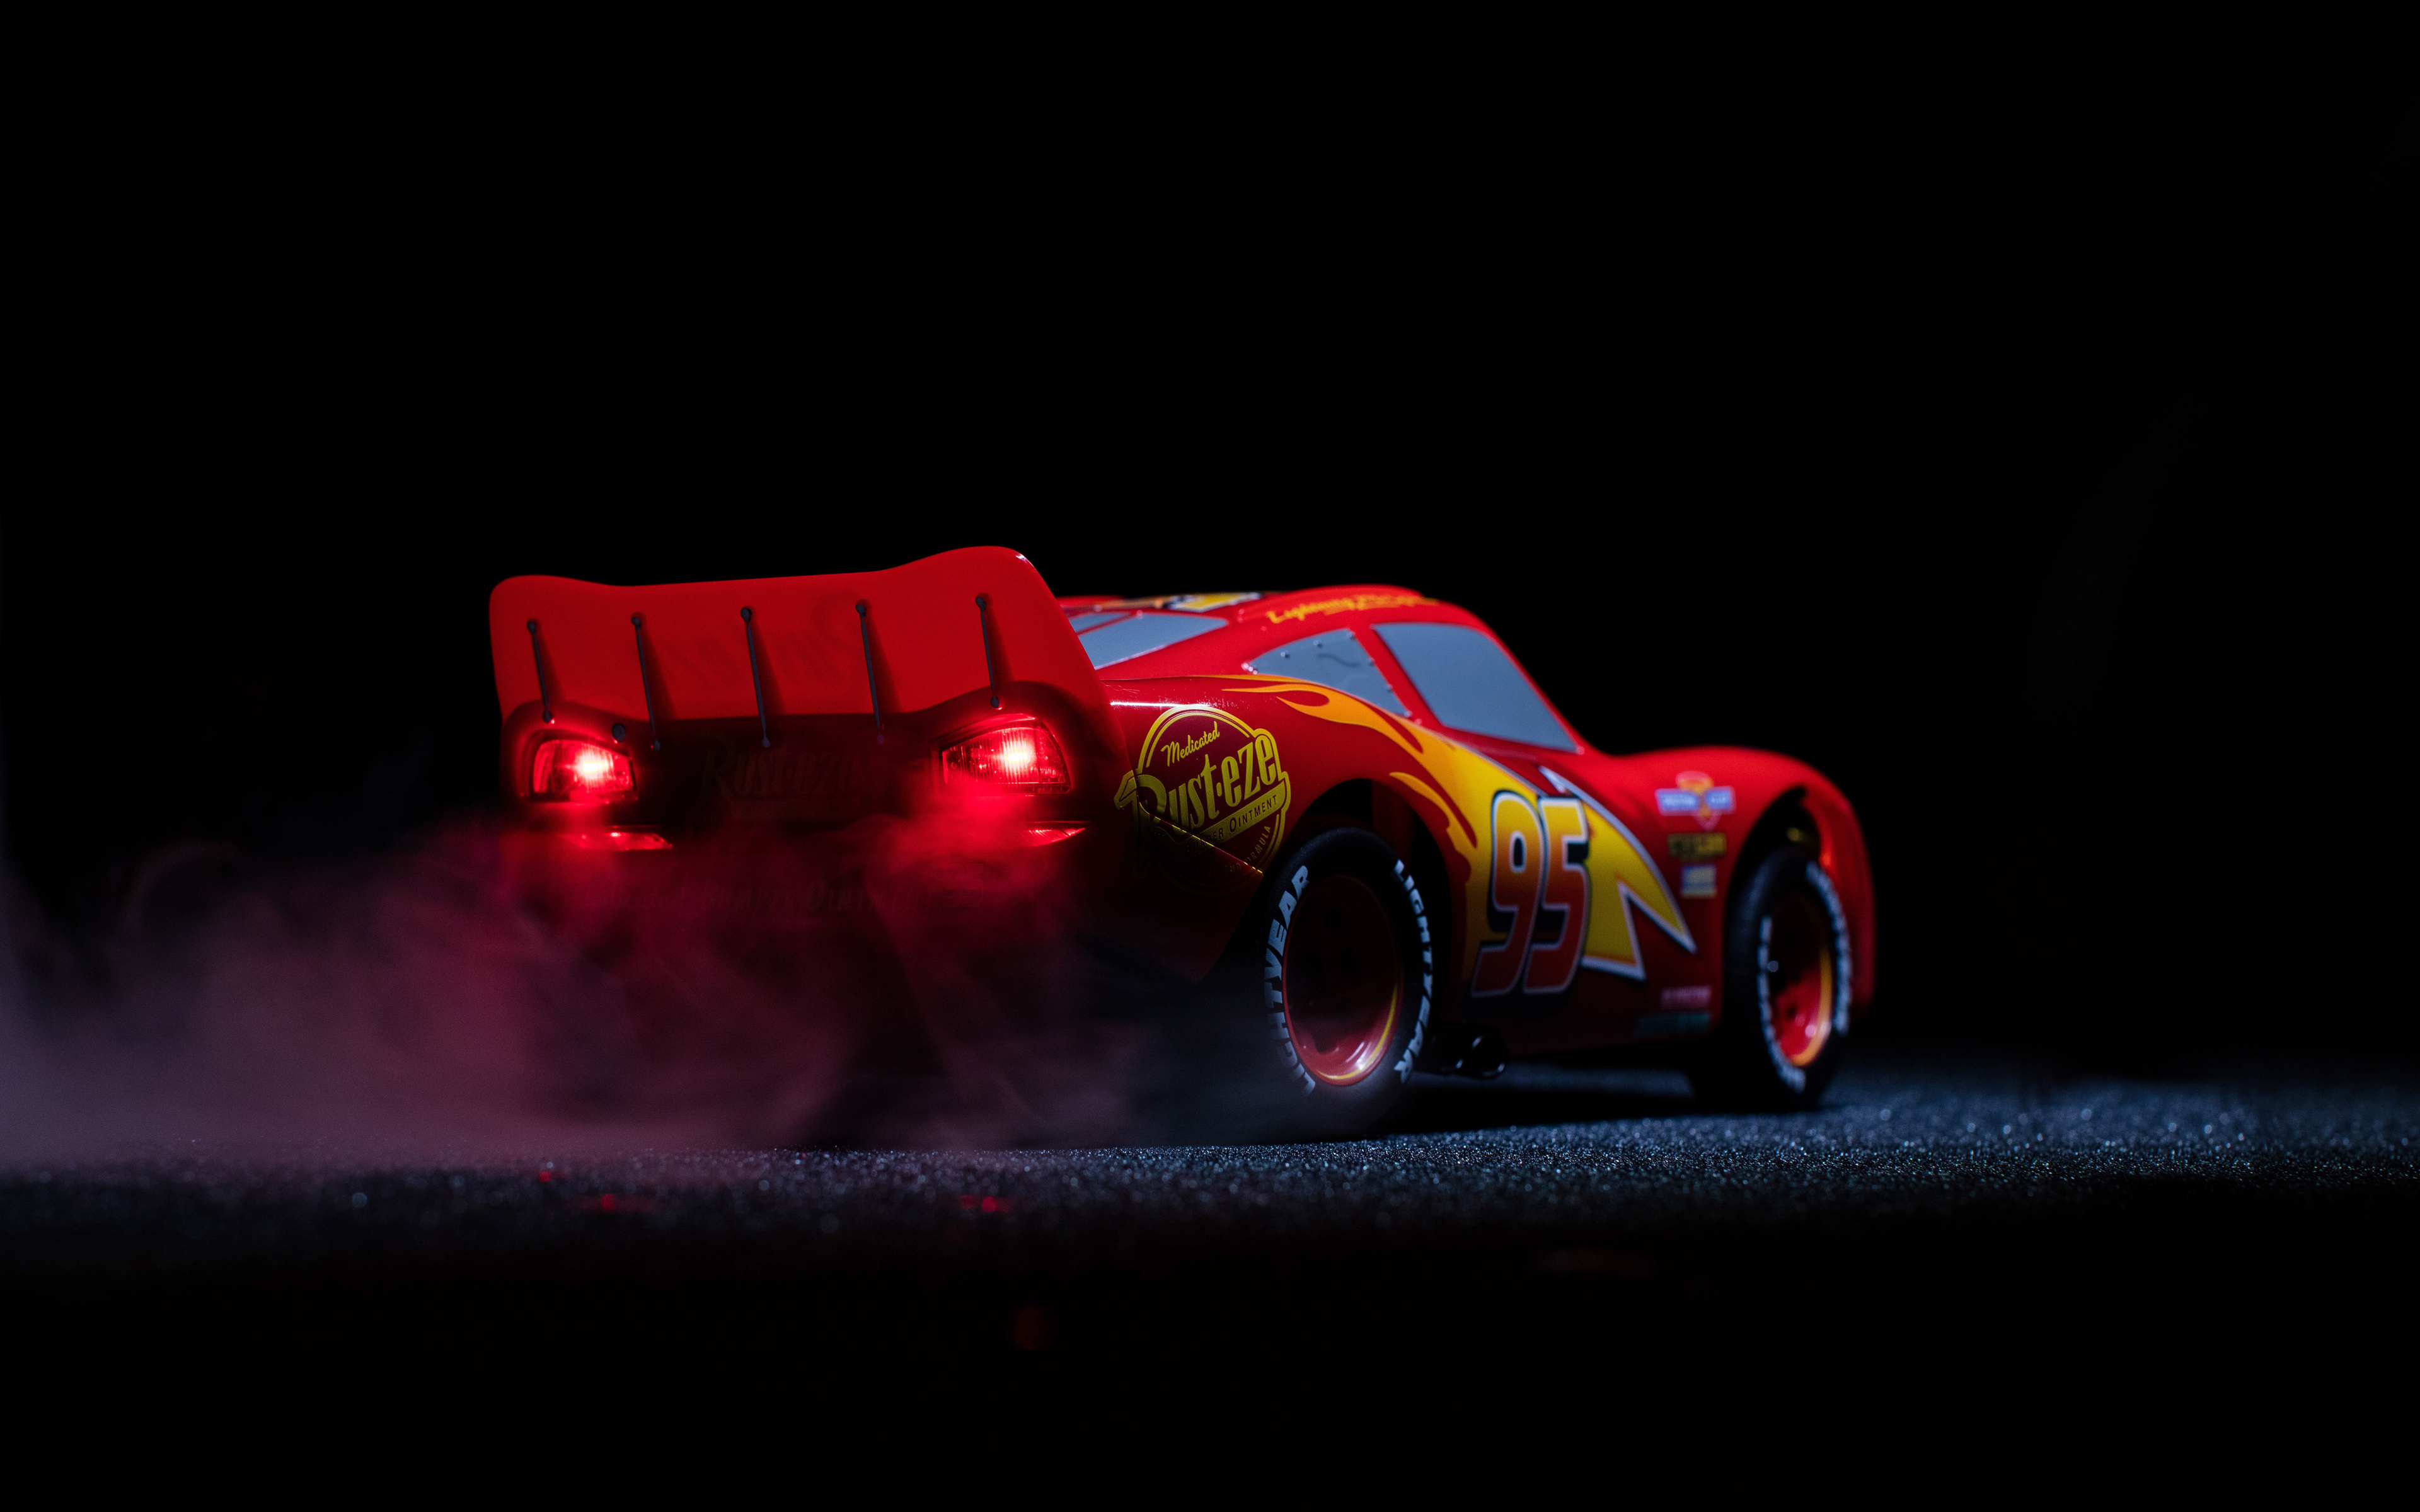 Lightning McQueen Wallpaper Full HD Pictures 3840x2400